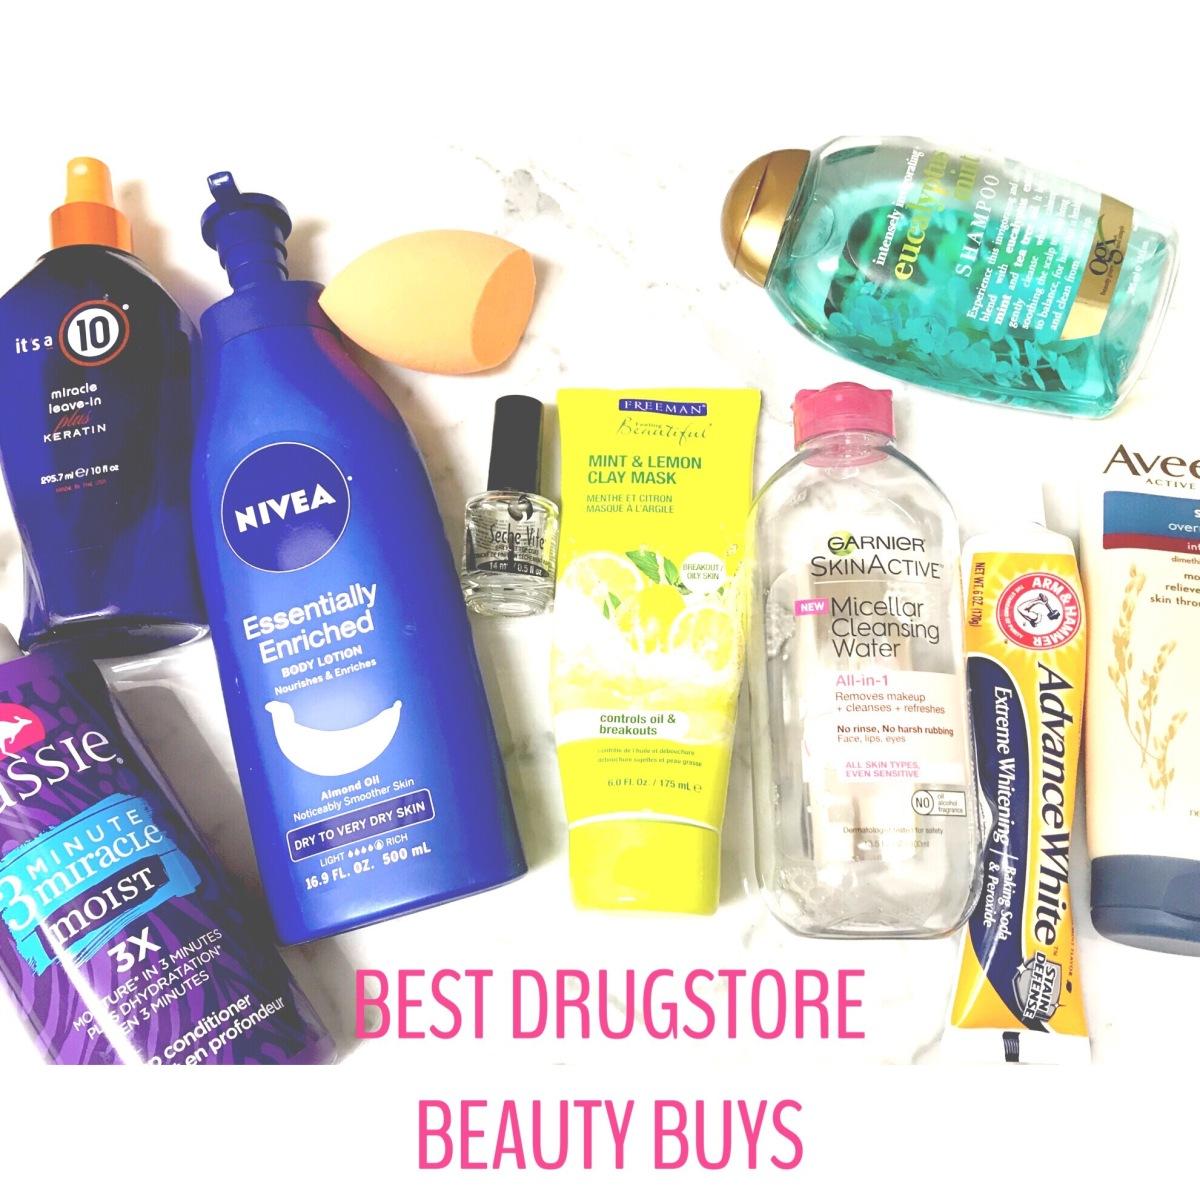 BEST Drugstore BeautyBuys